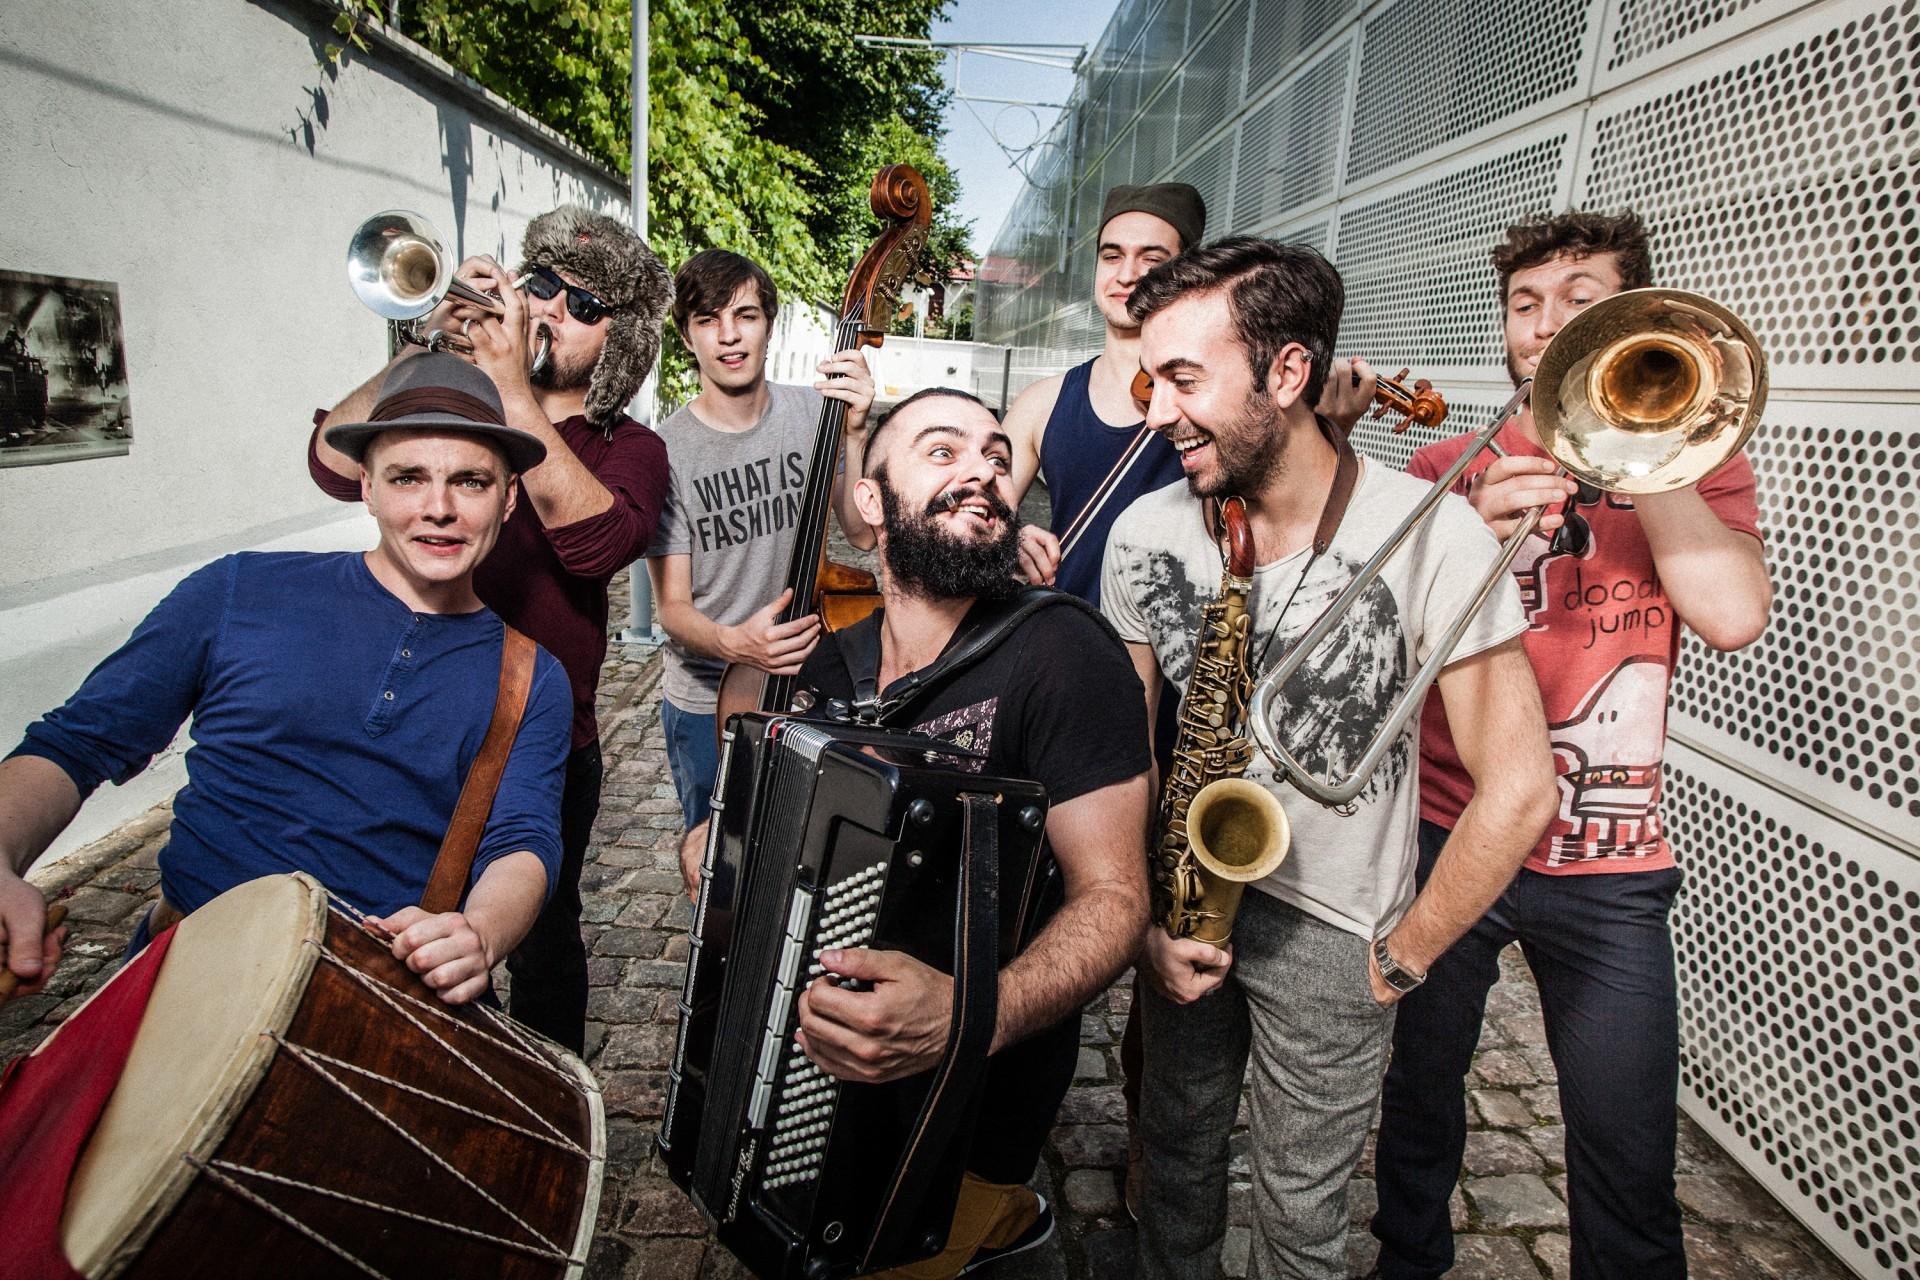 Kaszebe Music Festiwal